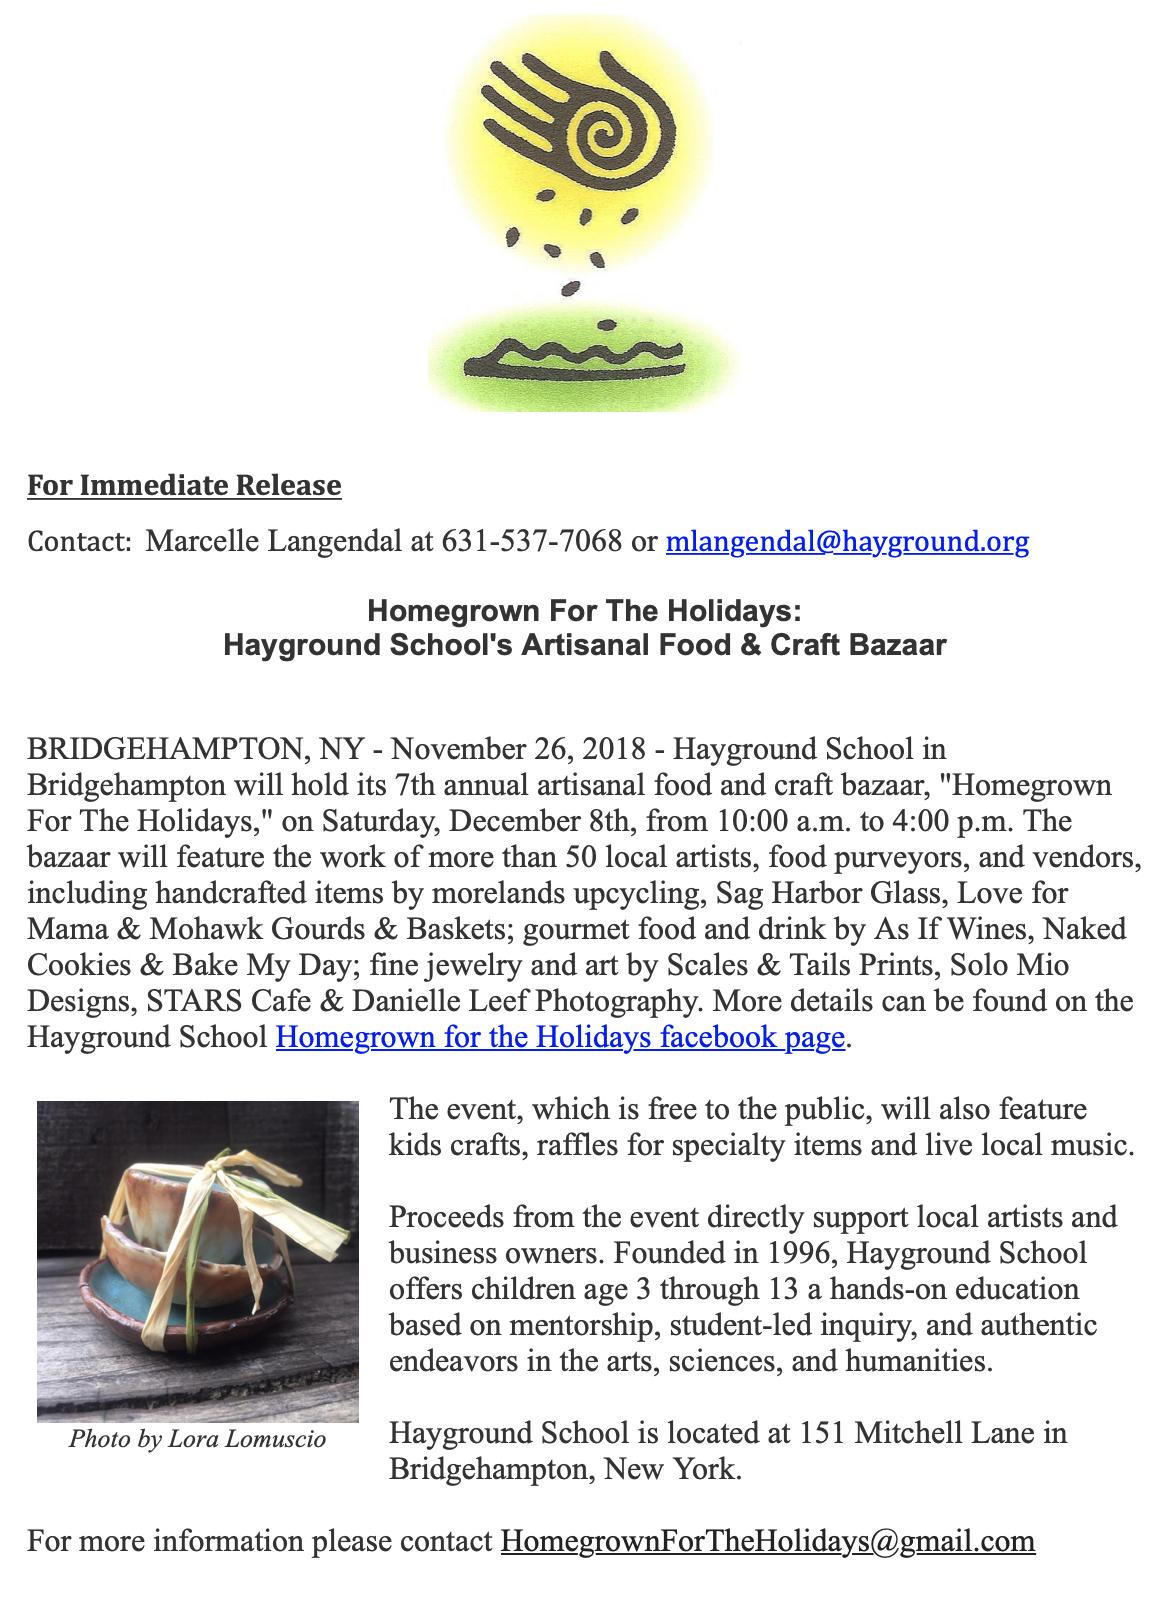 HG PRESS RELEASE 11.26.2018.jpg